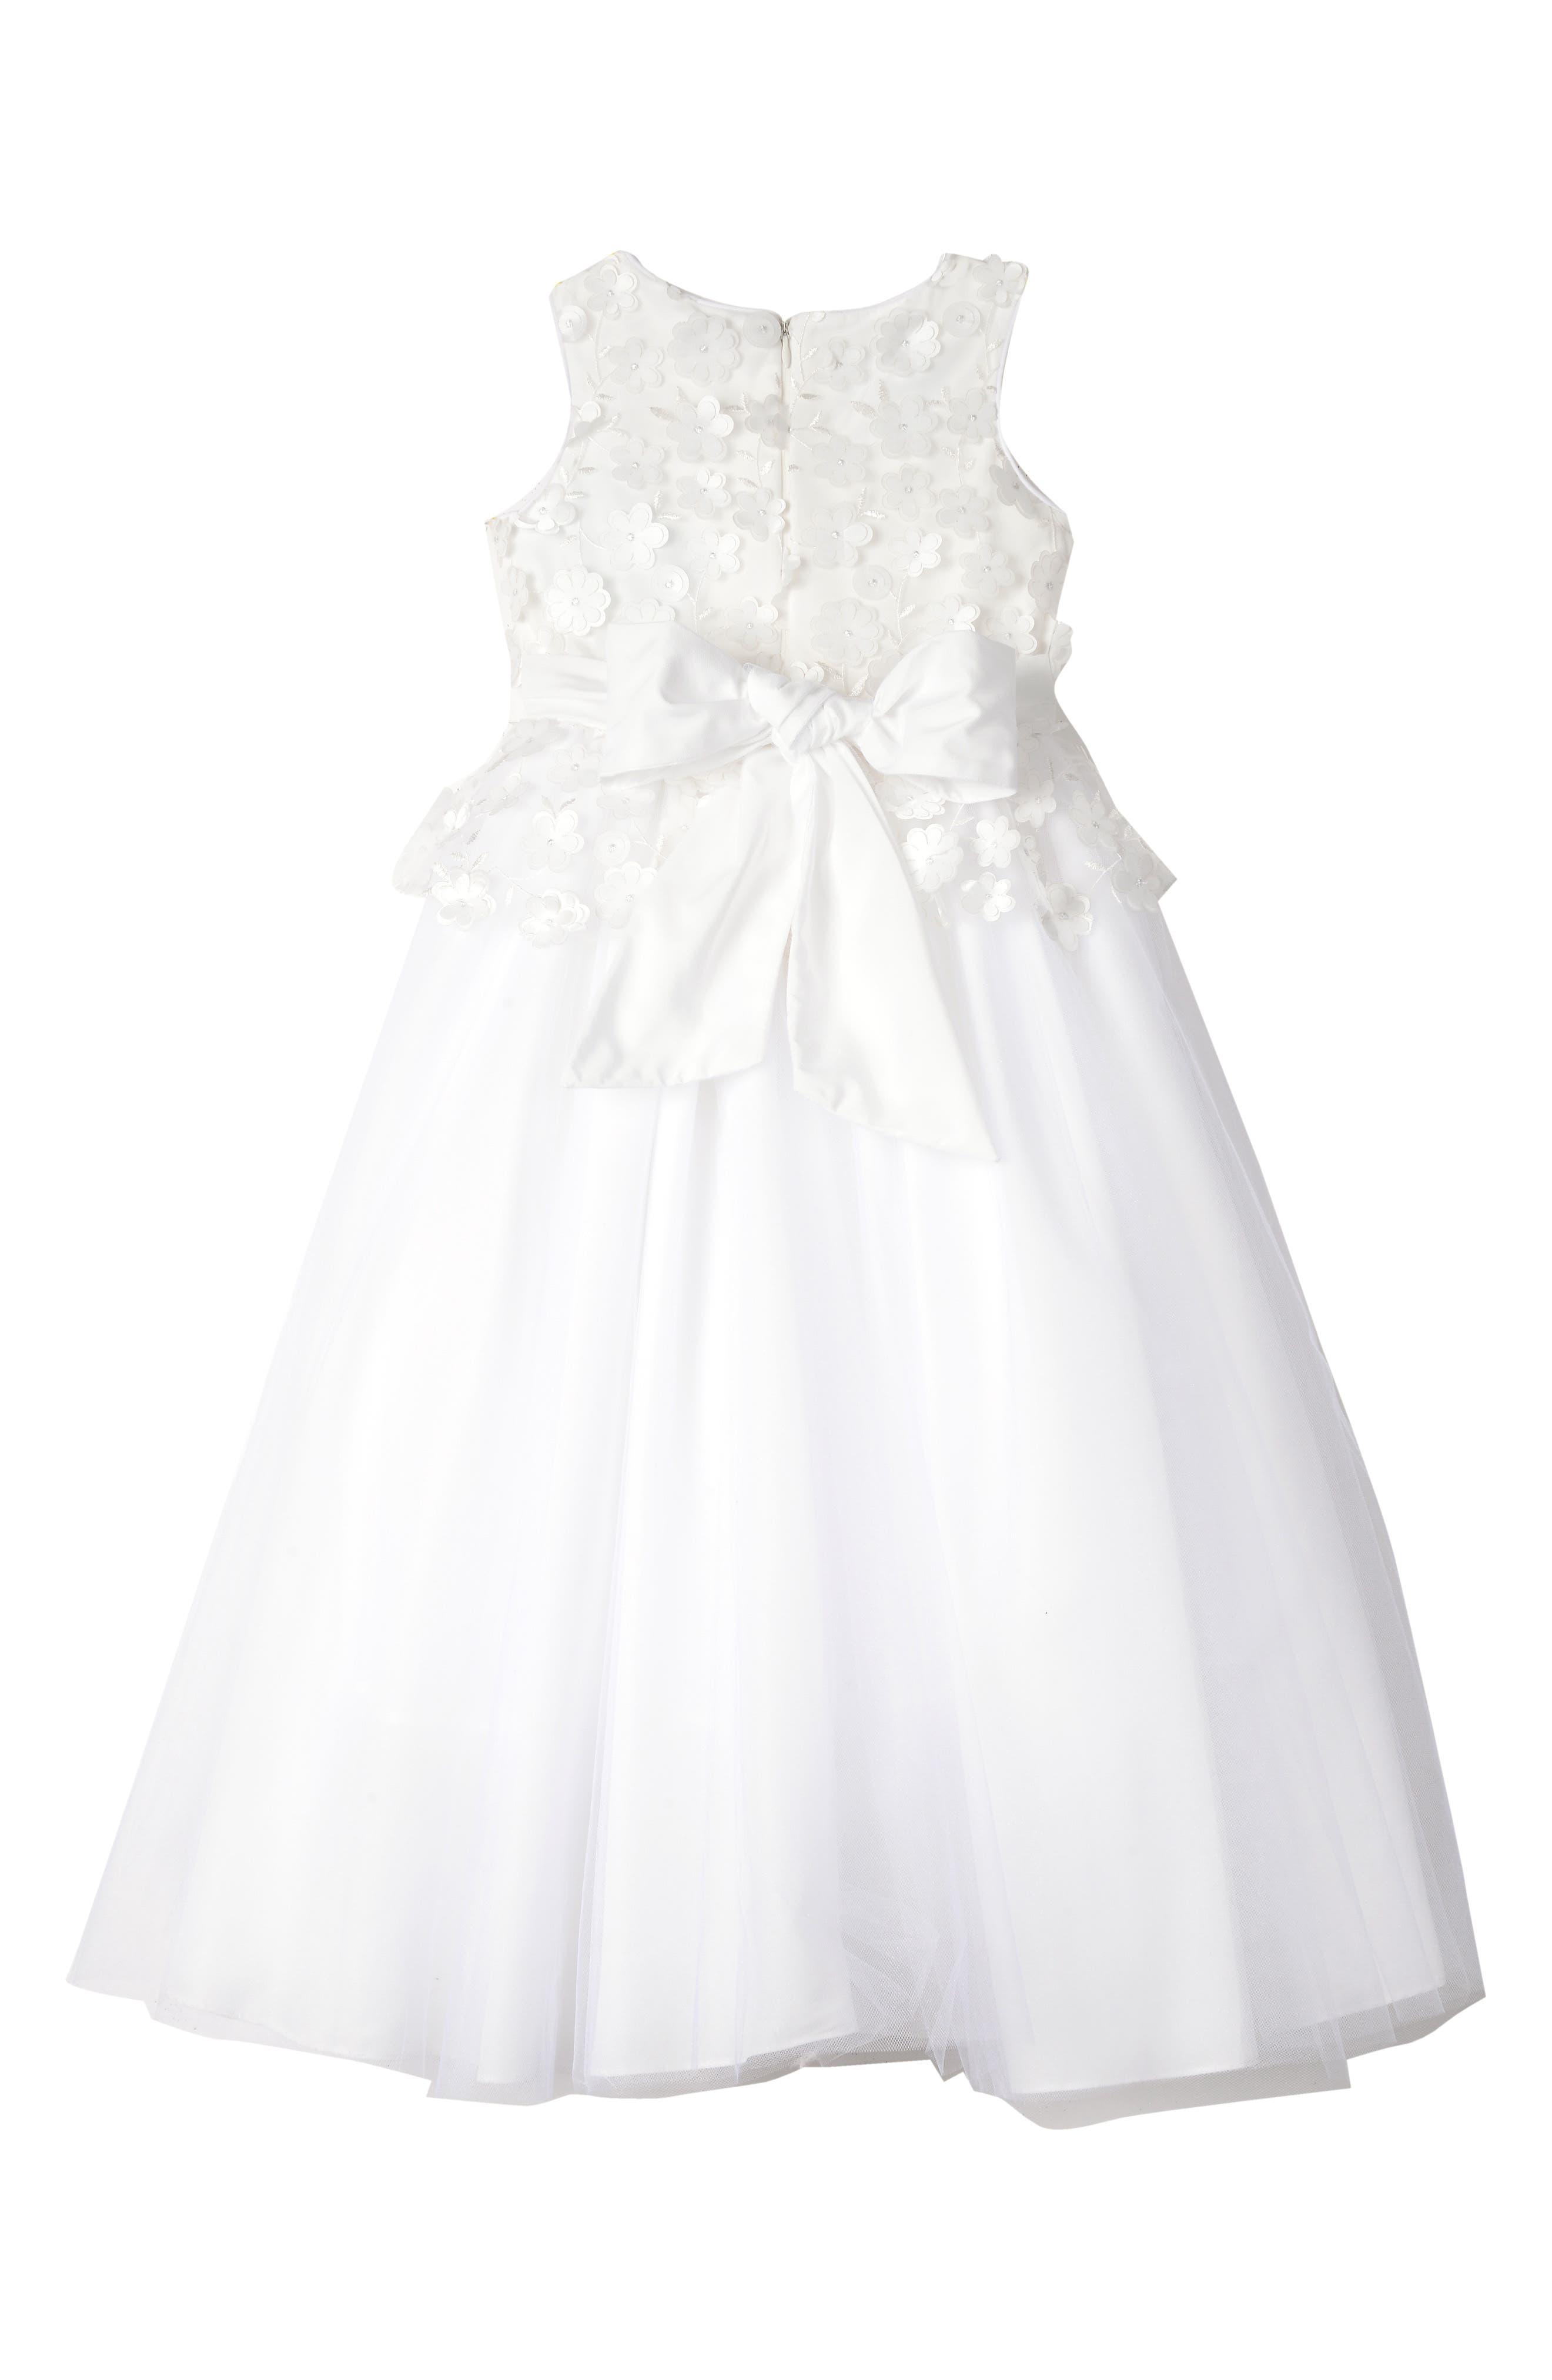 BADGLEY MISCHKA COLLECTION, Badgley Mischka 3D Flower Peplum Dress, Alternate thumbnail 2, color, WHITE